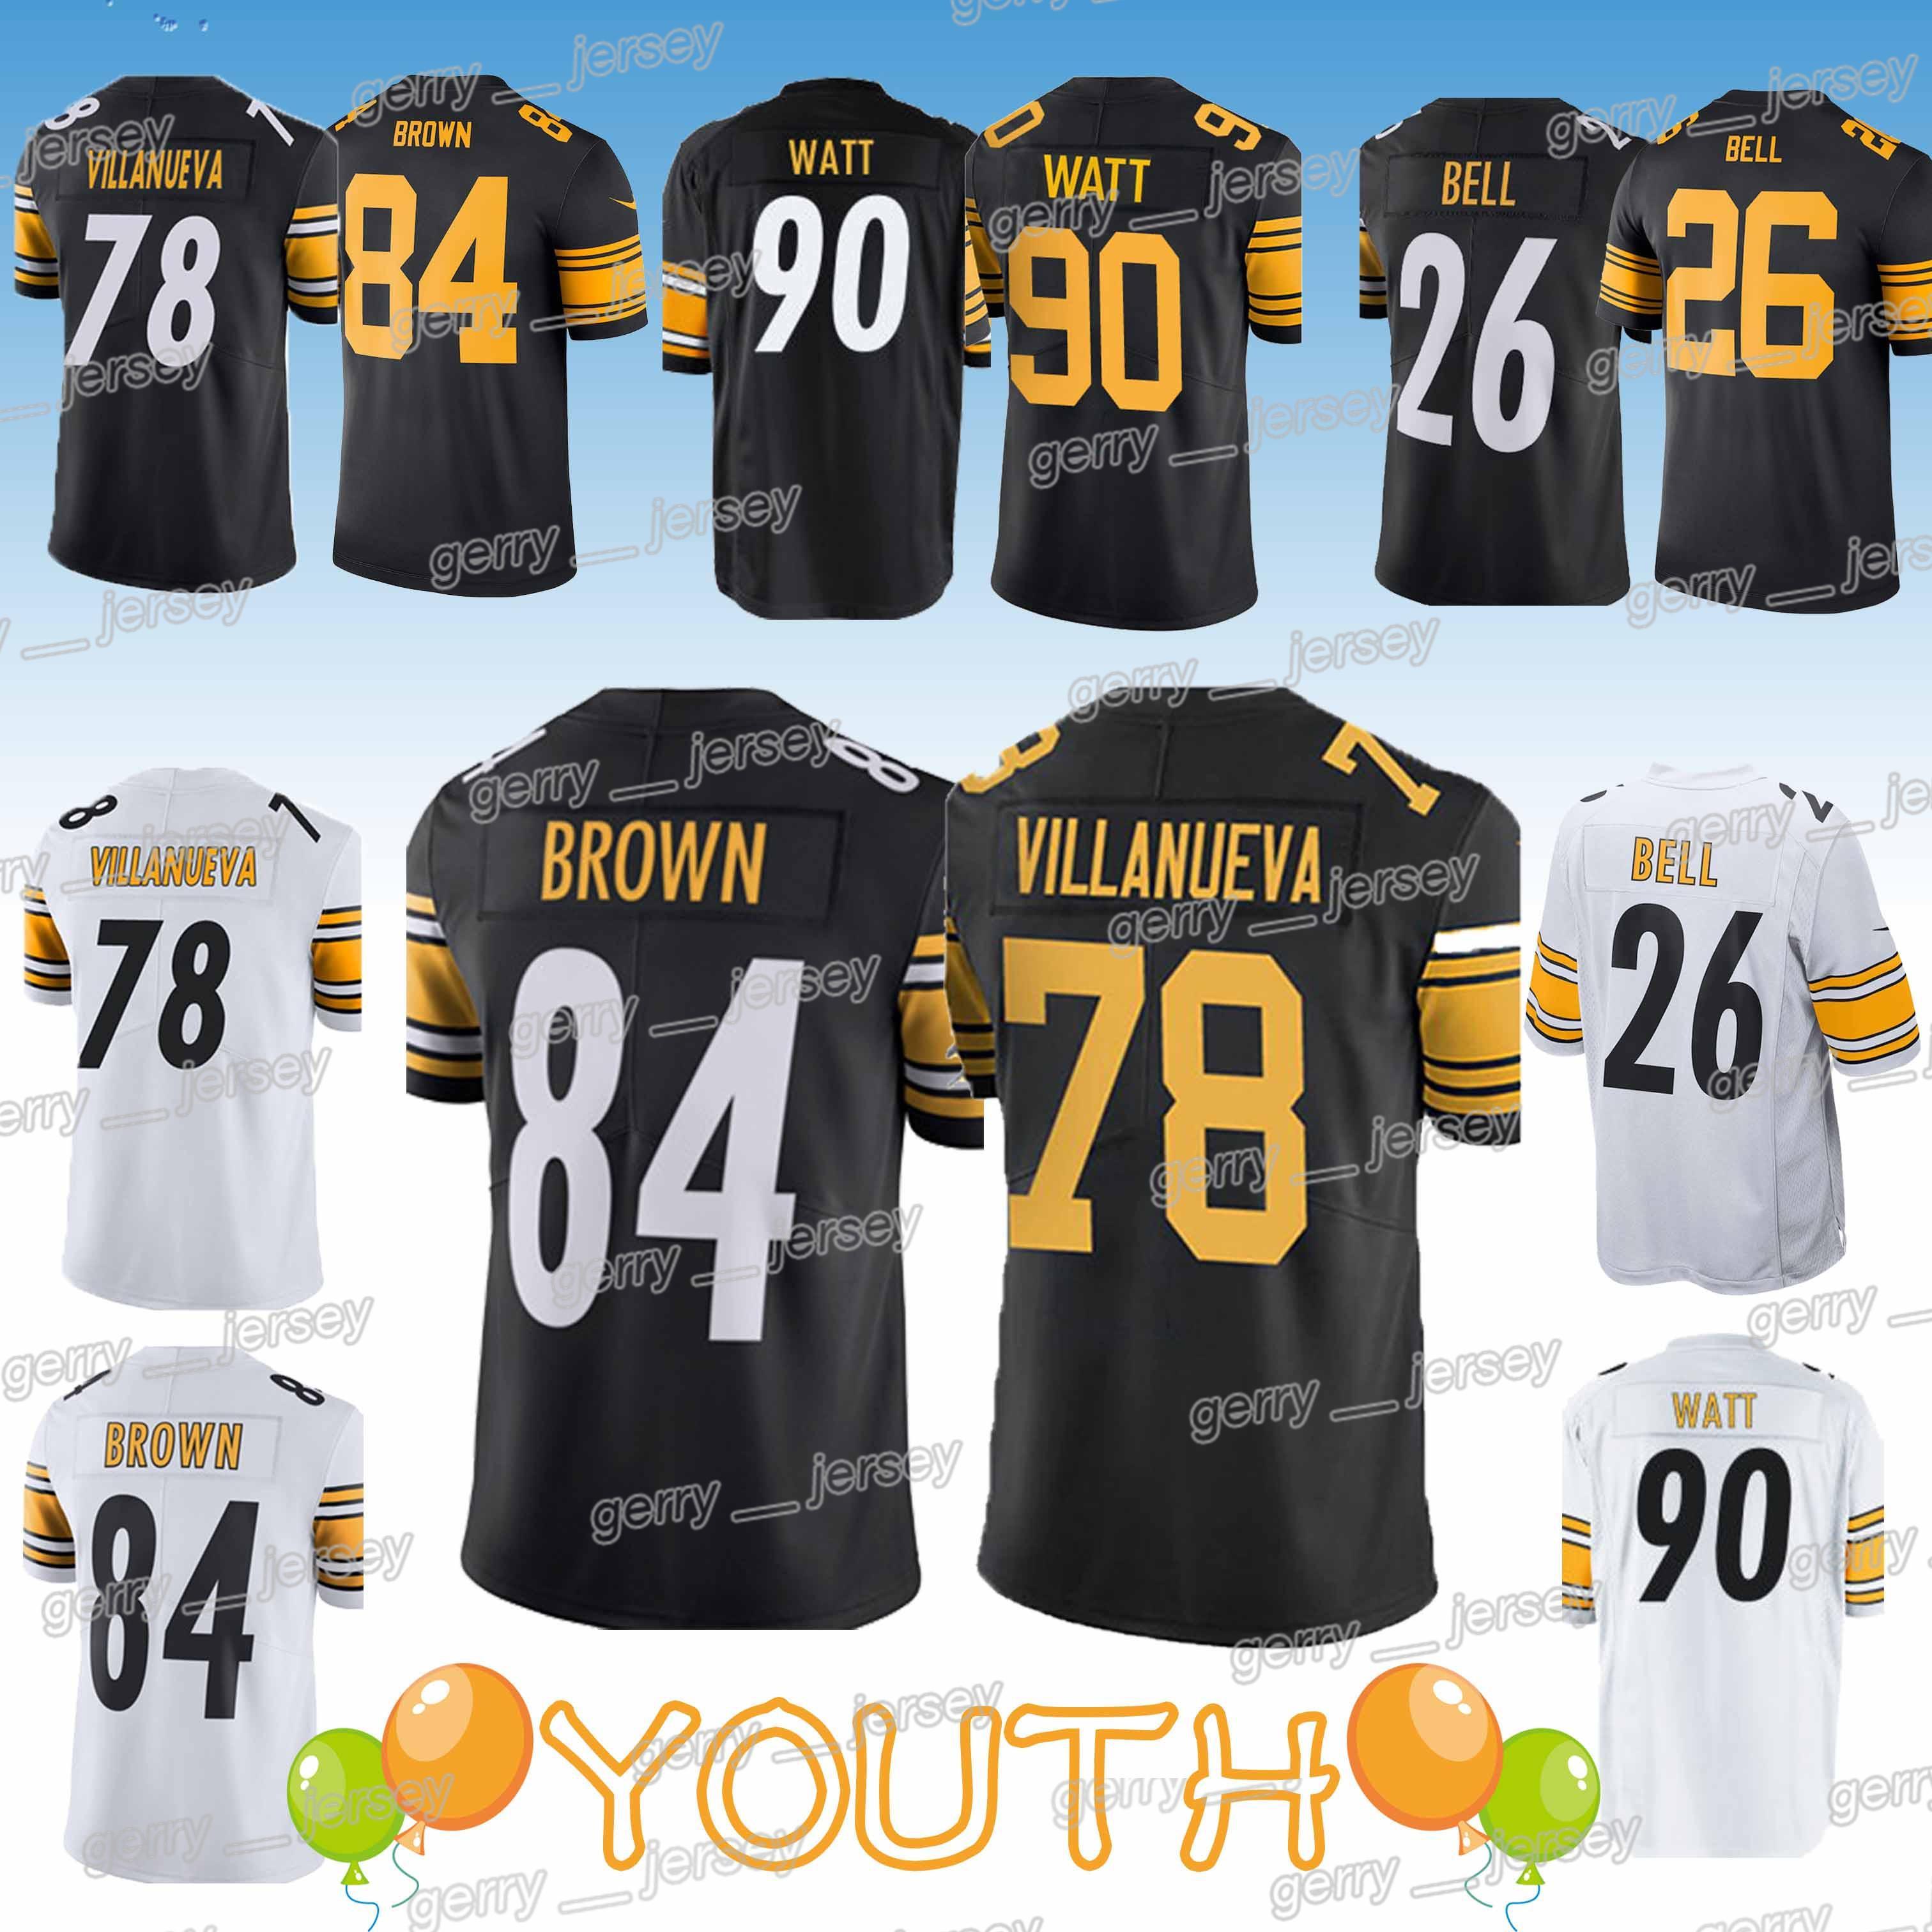 huge discount b1209 2847b Kids 84 Antonio Brown 78 Alejandro Villanueva child 90 T.J. Watt 26 Bell  Pittsburgh jerserys Steeler jersey YOUTH 2019 Design sweater